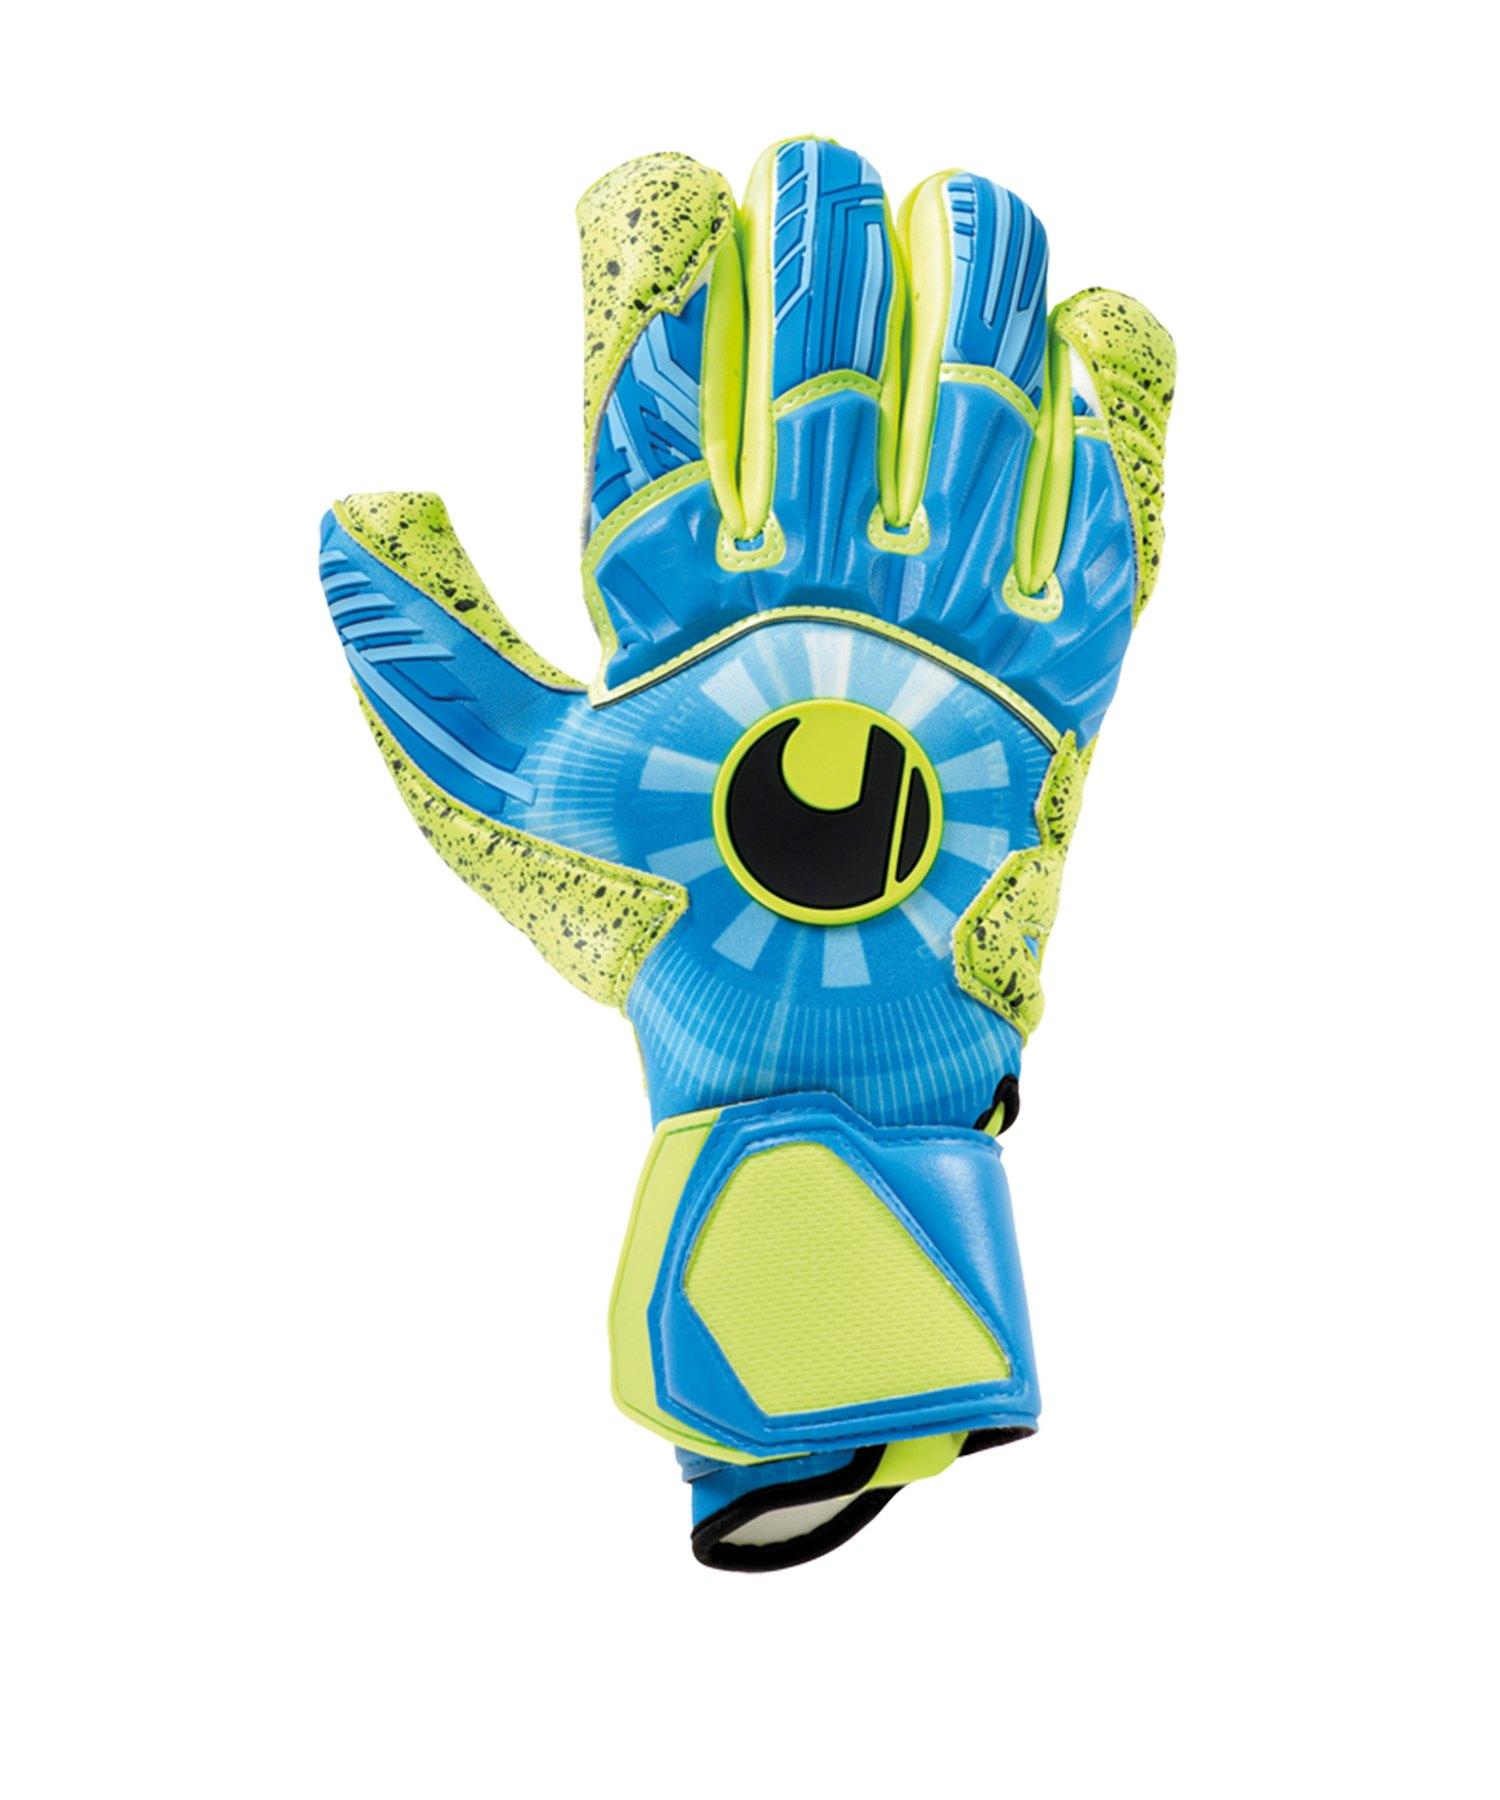 Uhlsport Radar Control Supergrip Handschuh F01 - Blau